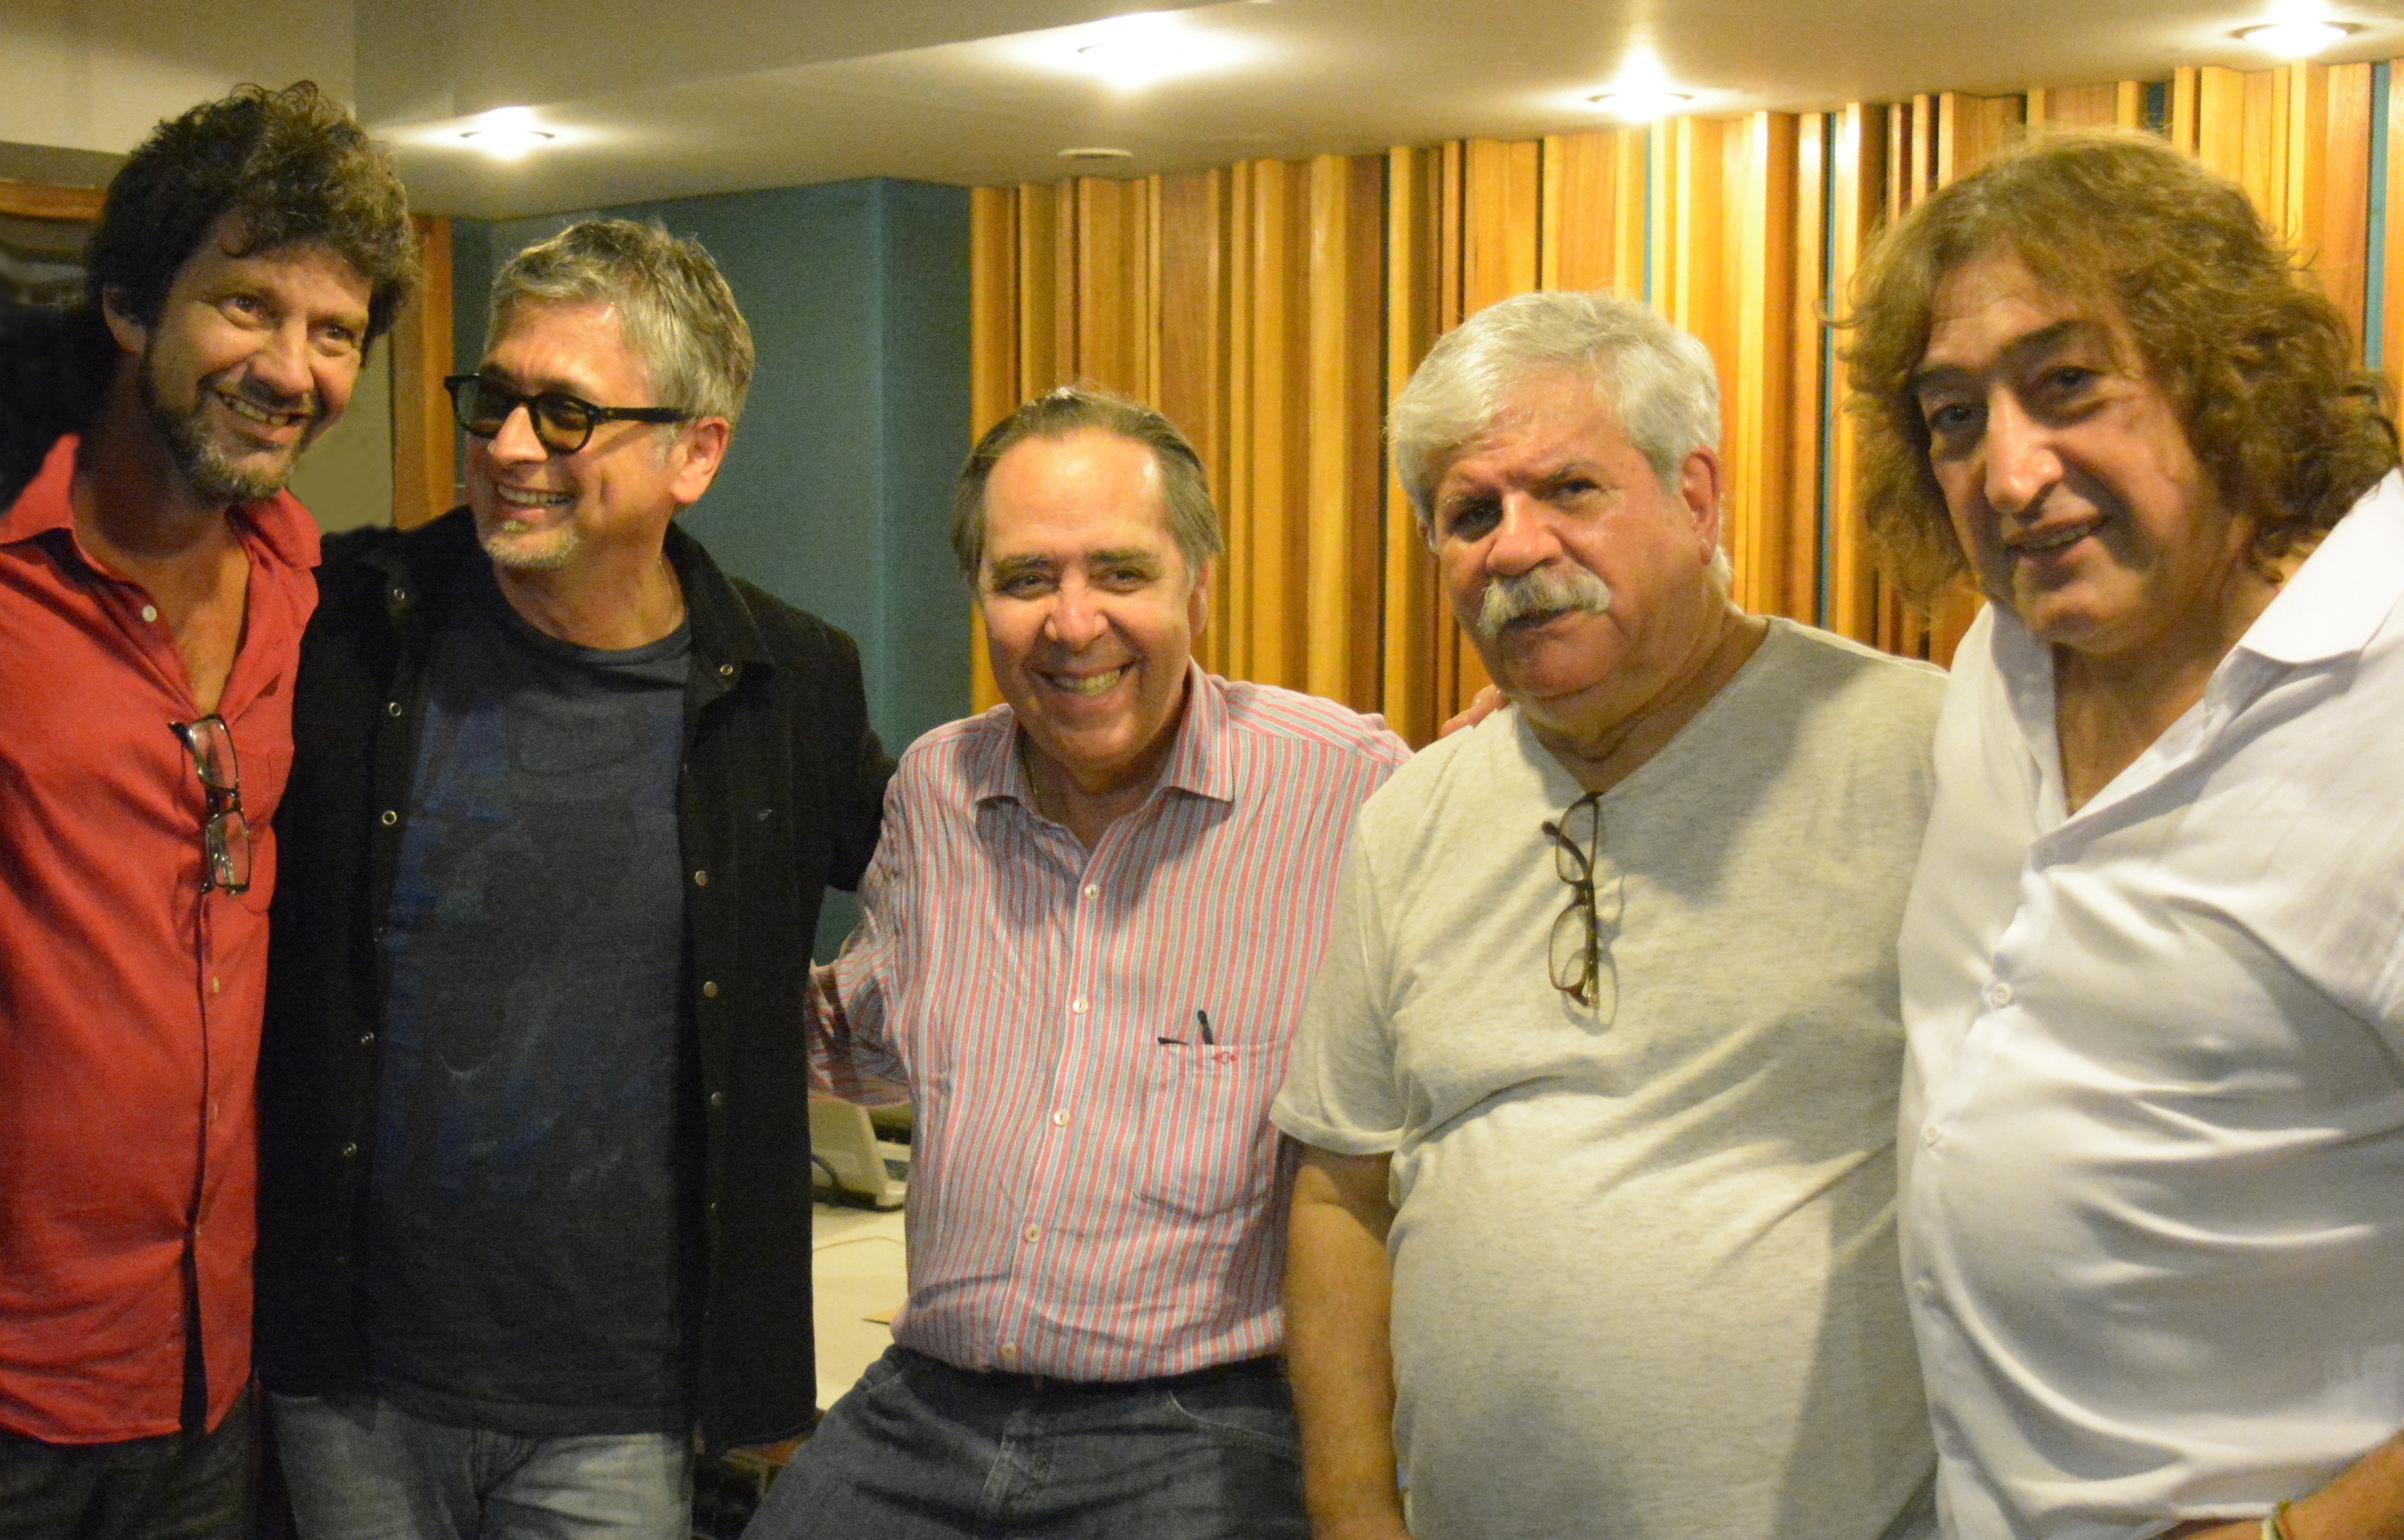 Igor Eça, Zé Renato, Edu Lobo< Dori Caymmi e Toninho Horta